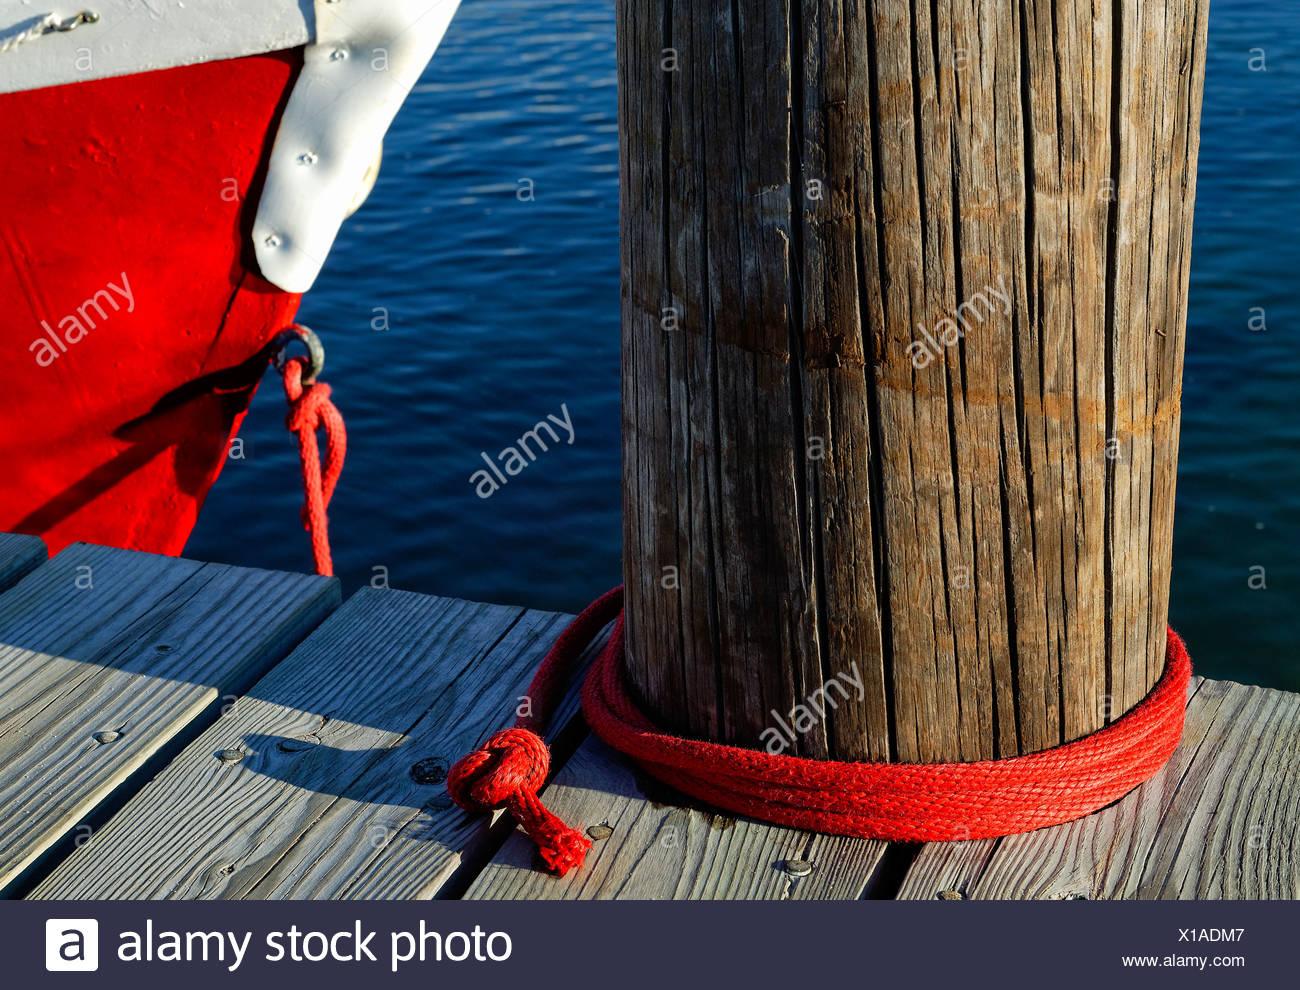 Boat tied to a dock, Vineyard Haven, Martha's Vineyard, Massachusetts, USA - Stock Image